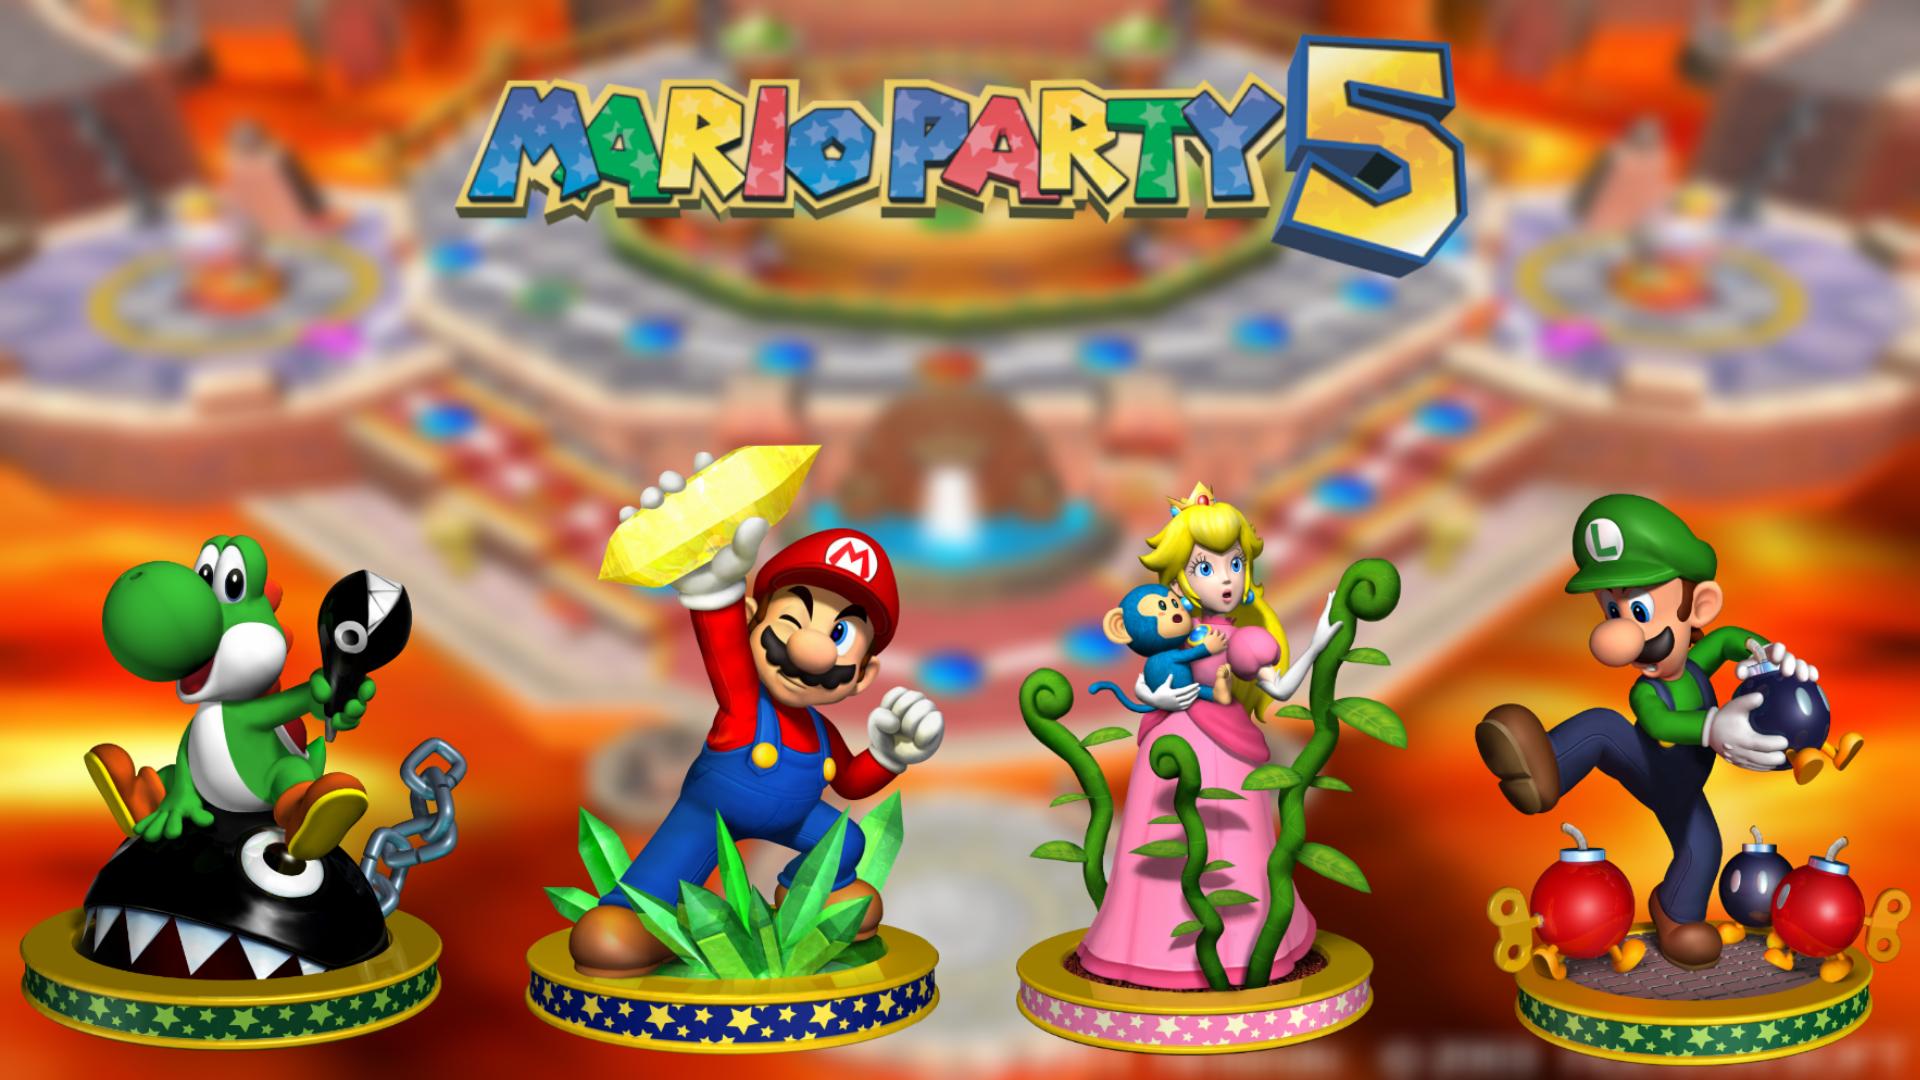 mario party 5 details